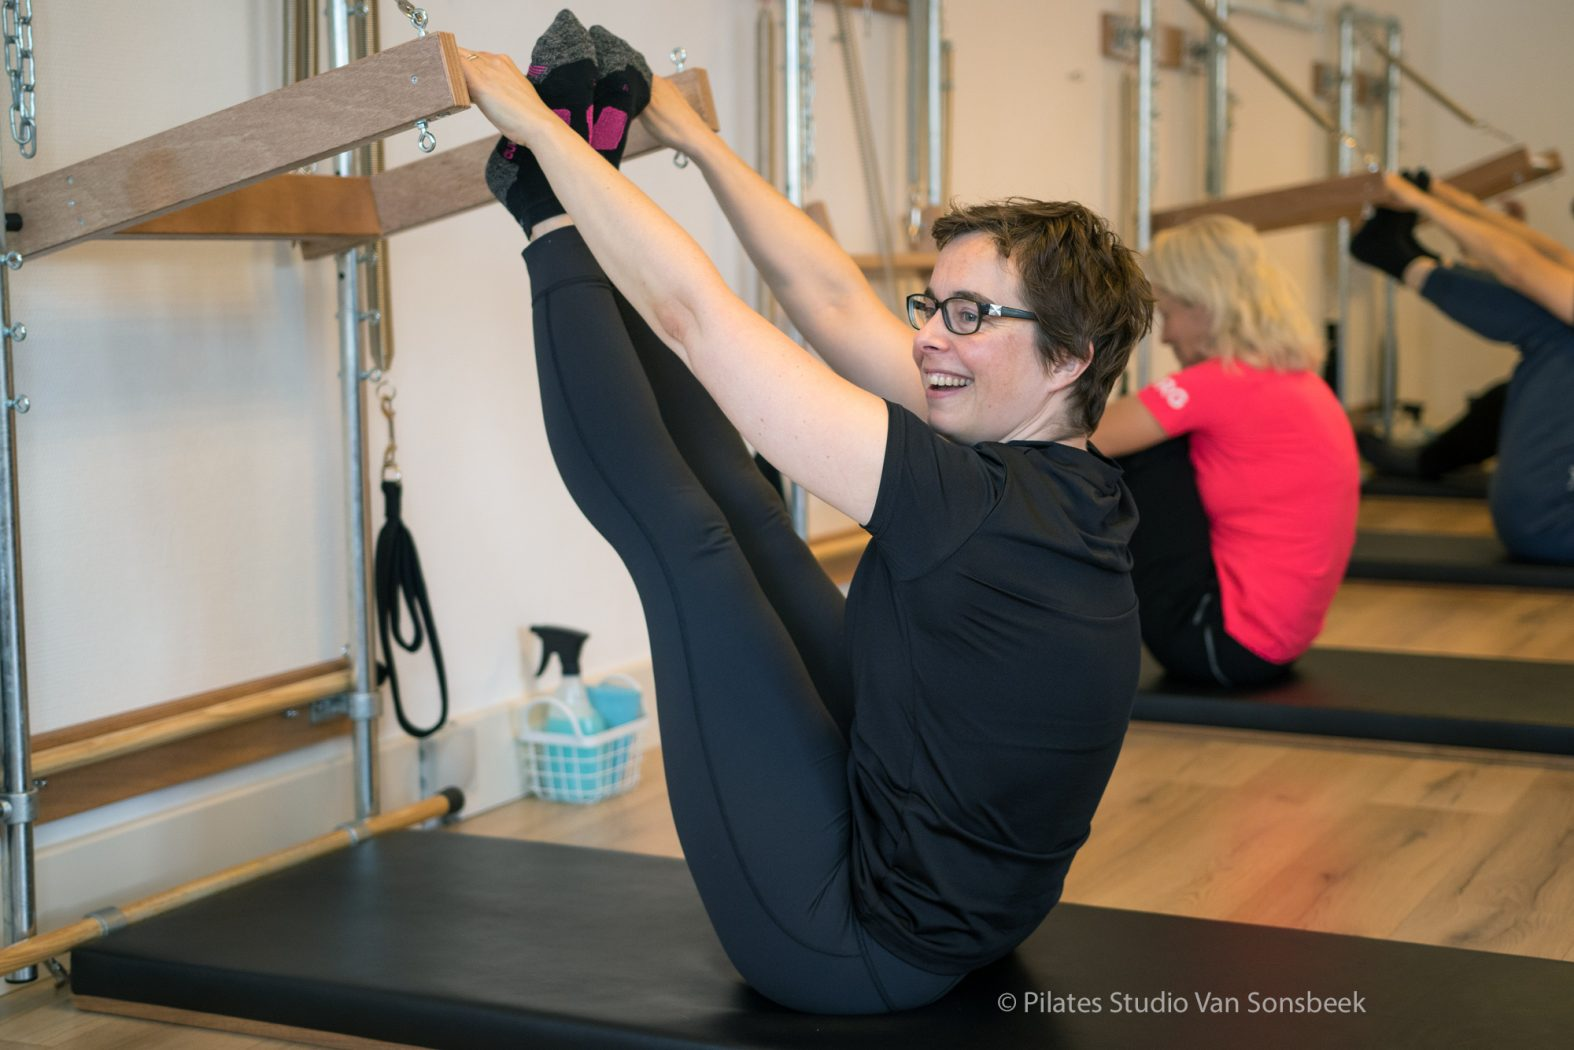 Pilates plezier! Wall Tower bij Pilates Studio van Sonsbeekar